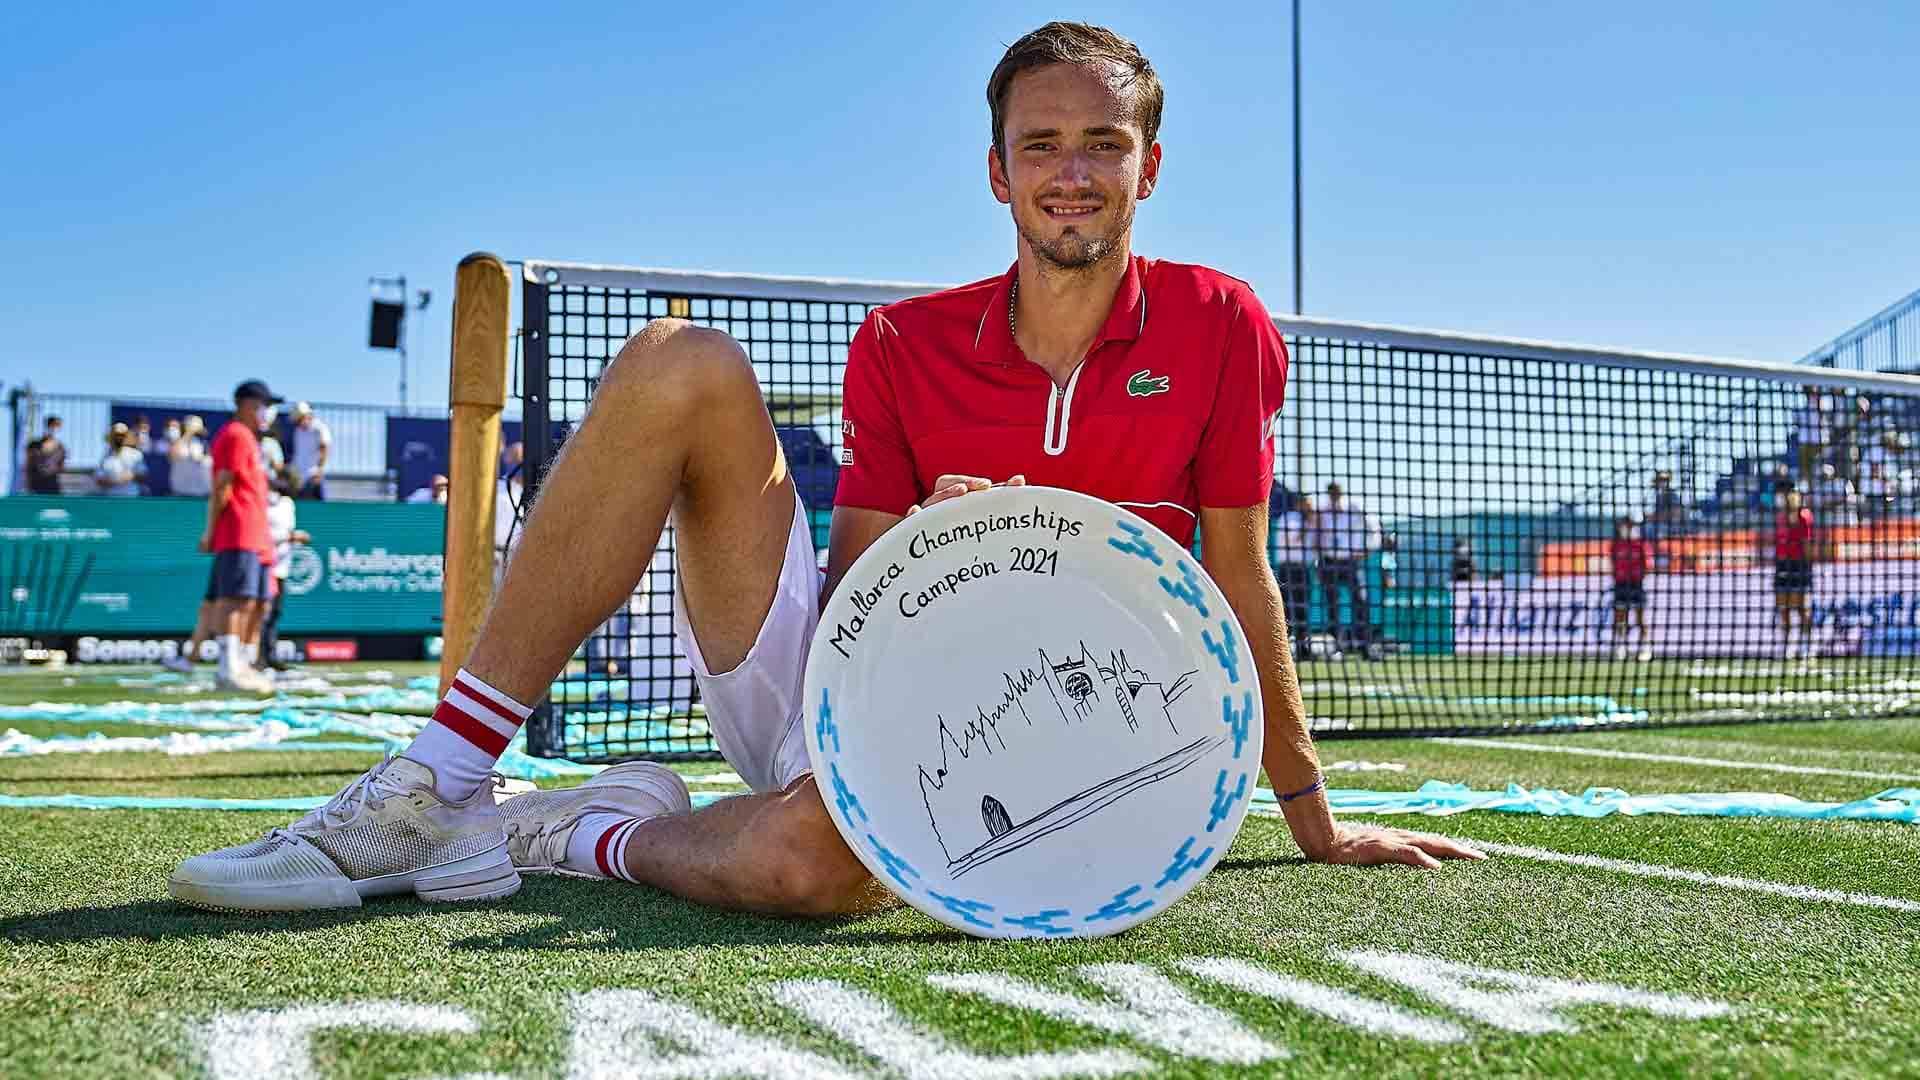 medvedev mallorca 2021 saturday trophy - Drugi tenisač sveta zmagoslaven na Mallorci